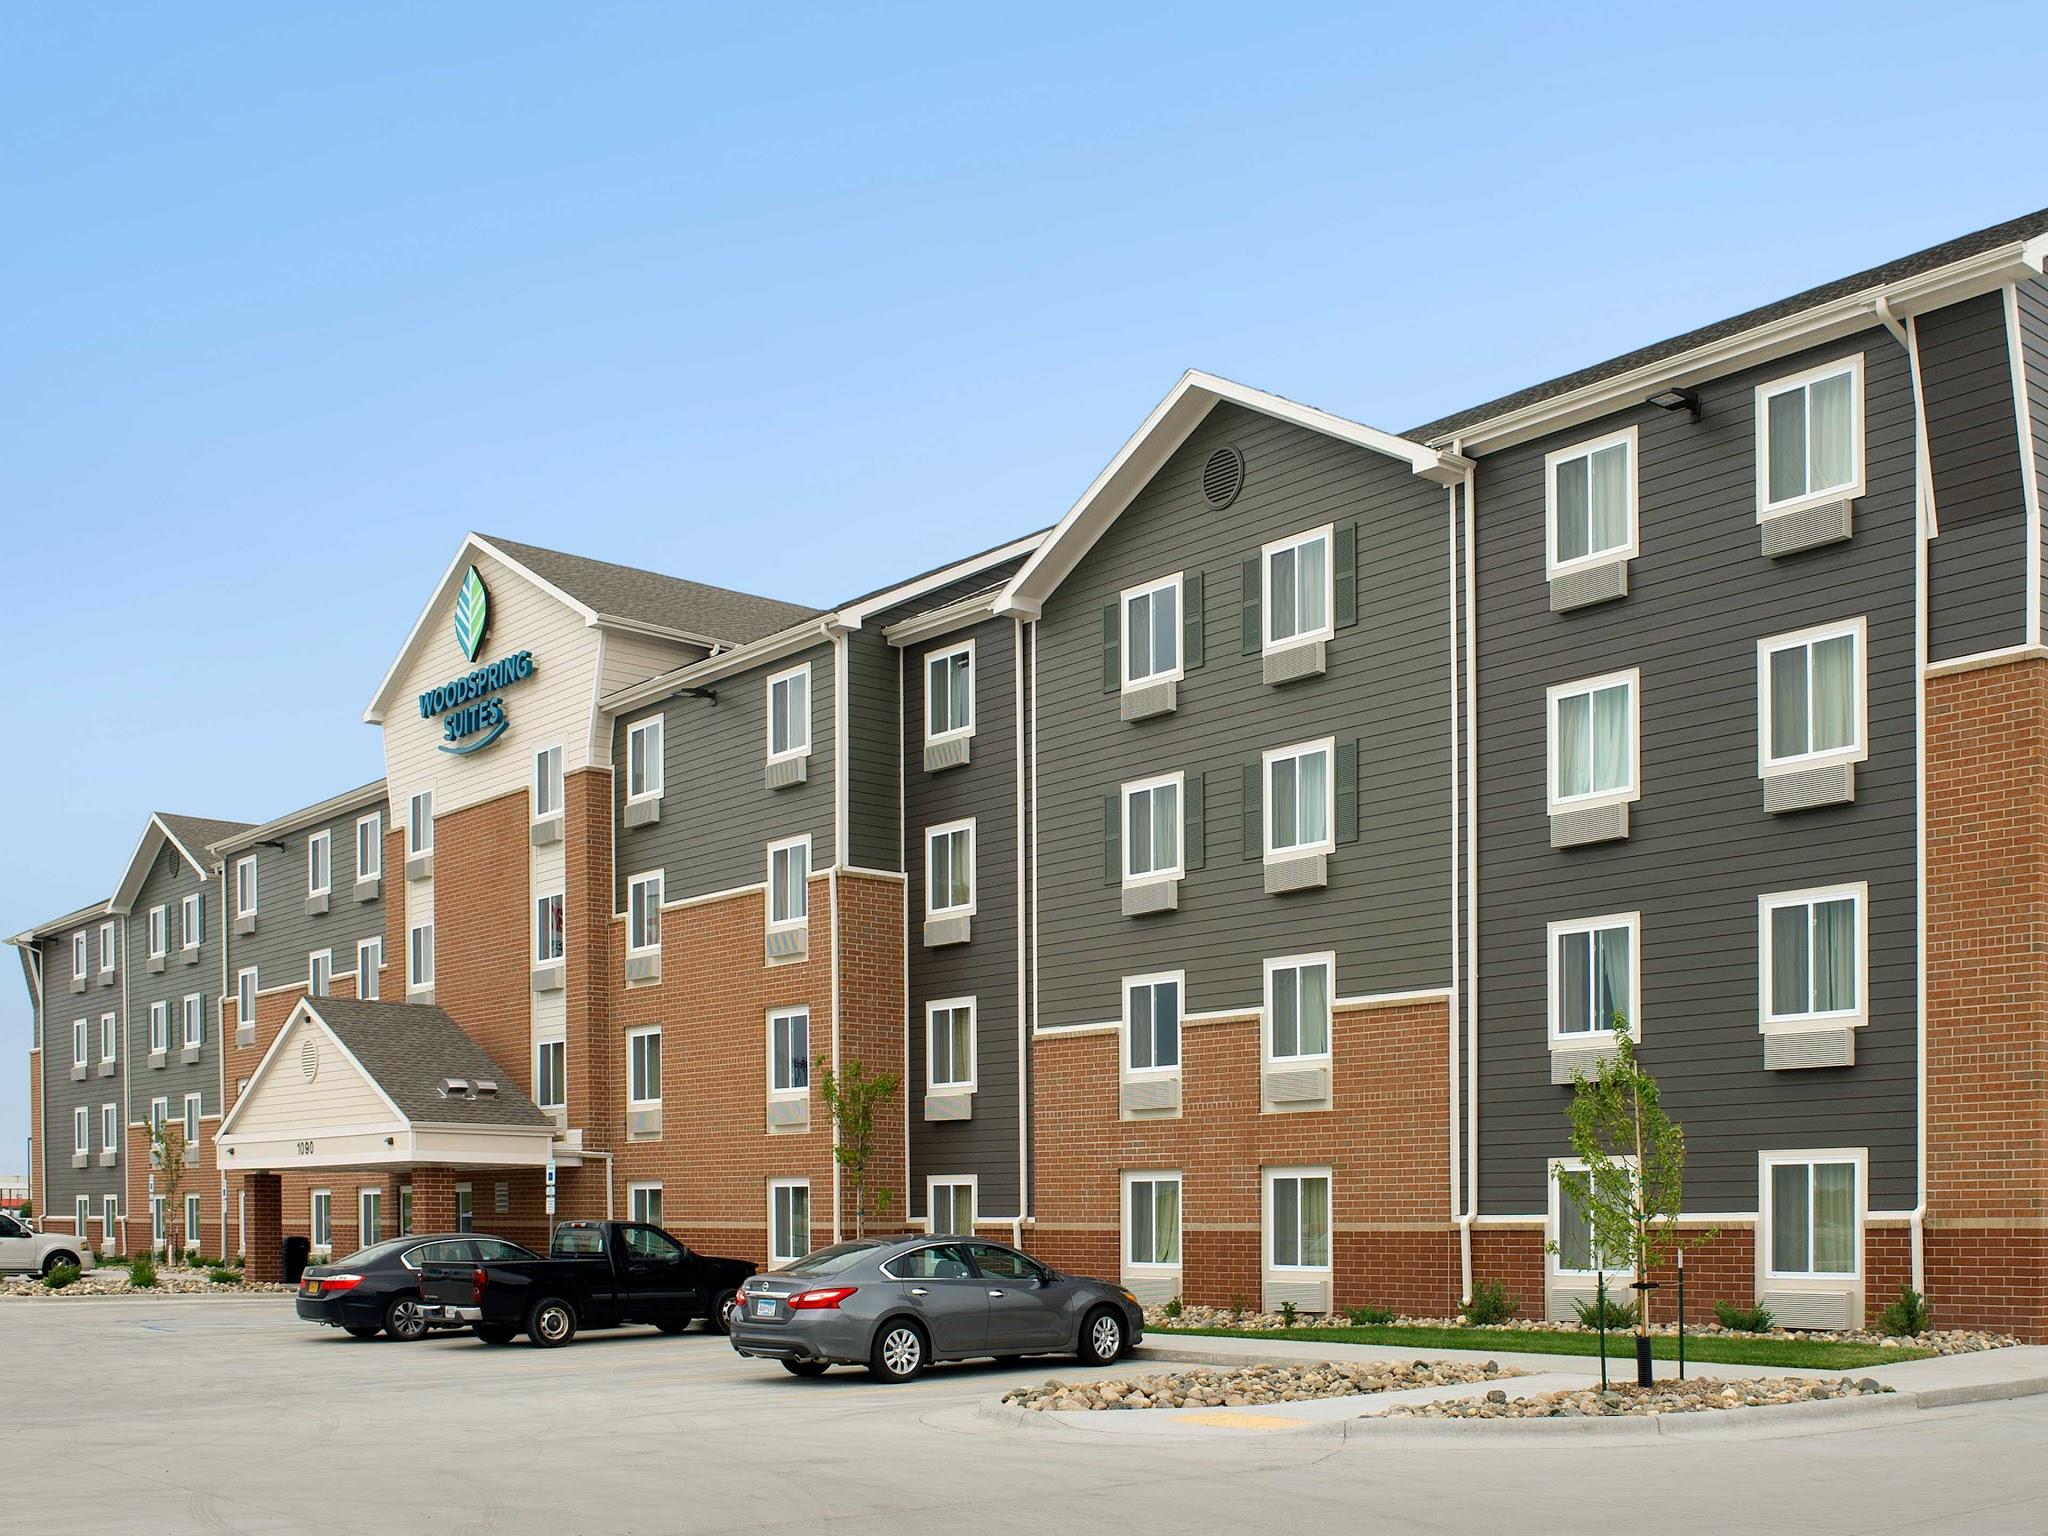 WoodSpring Suites Fargo image 10